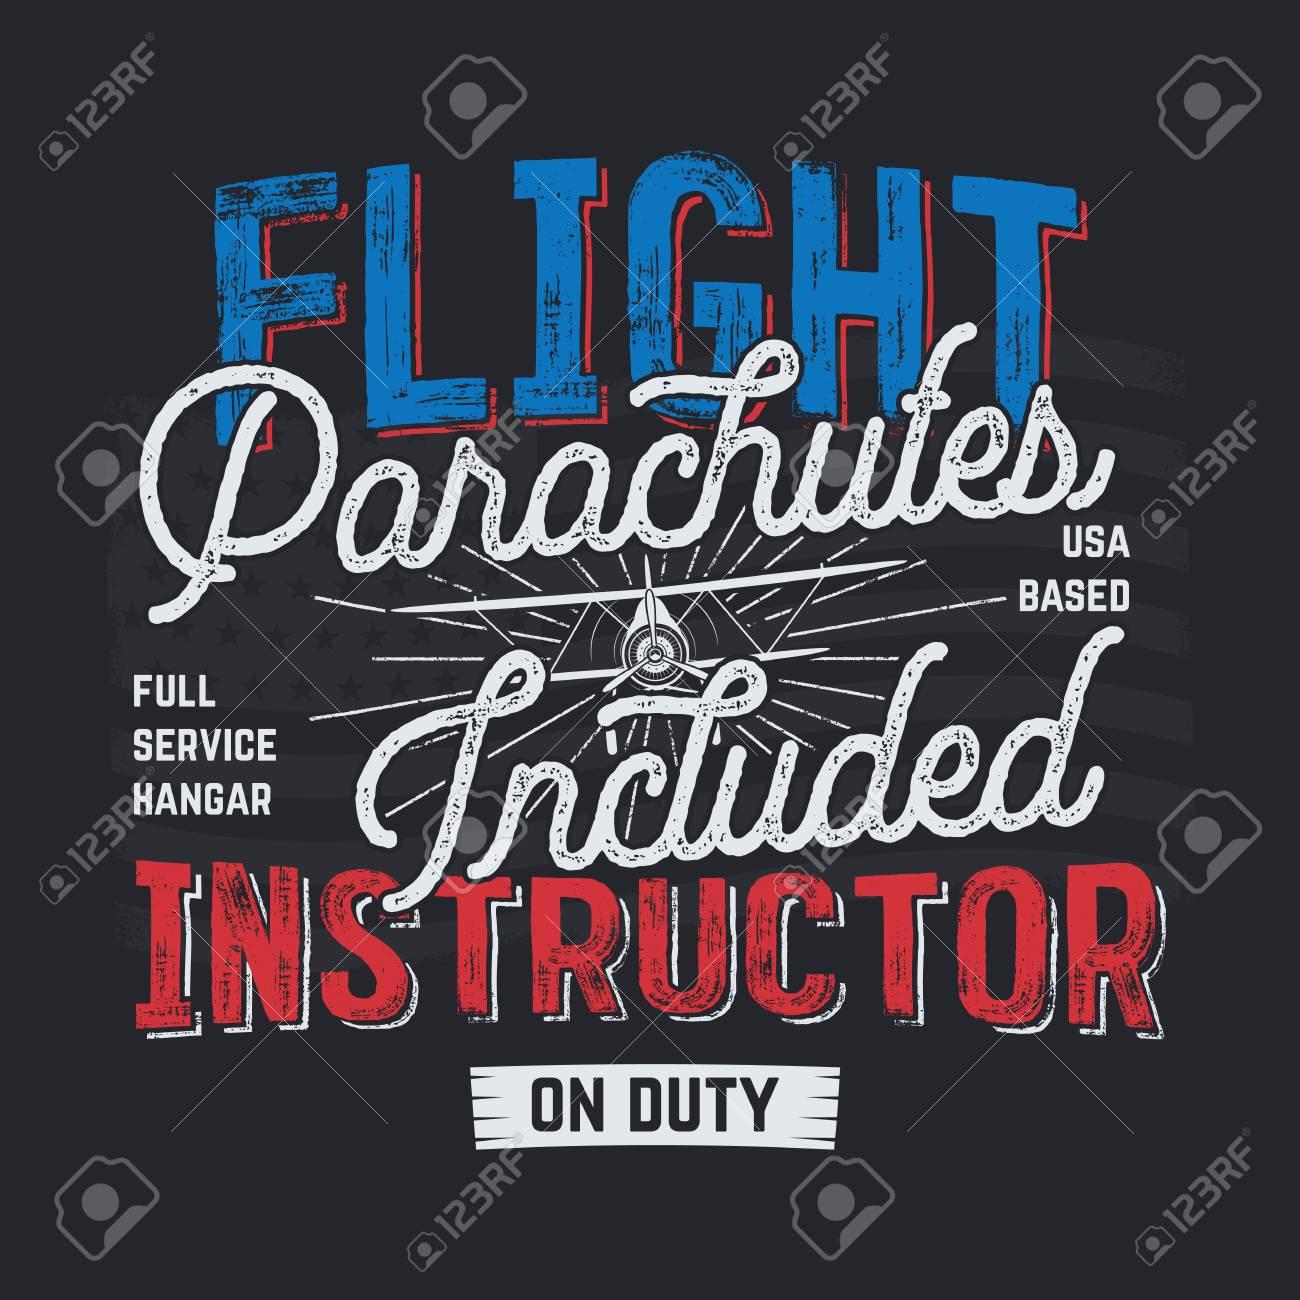 Vintage hand drawn tee graphic design  Flight Instructor quote